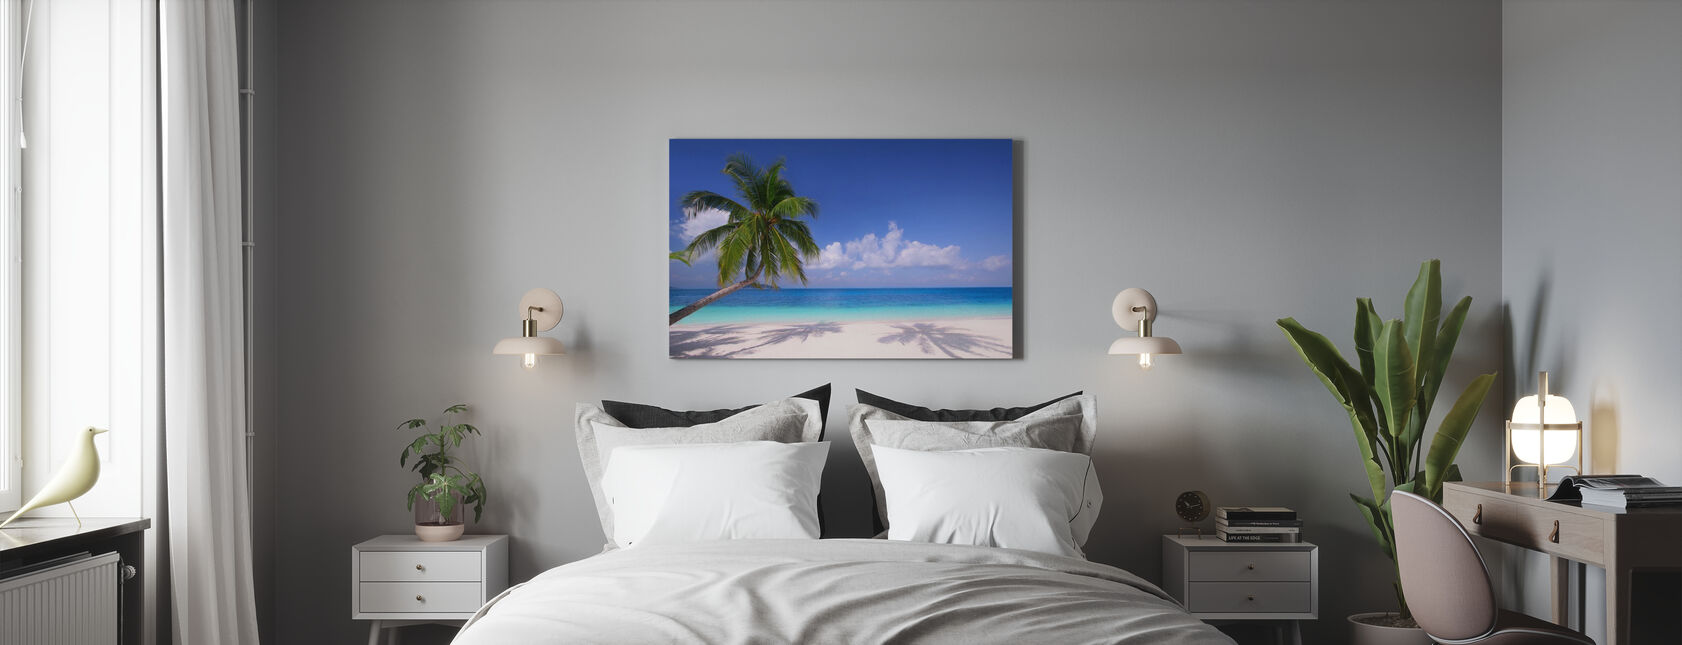 Island Paradise - Canvas print - Bedroom